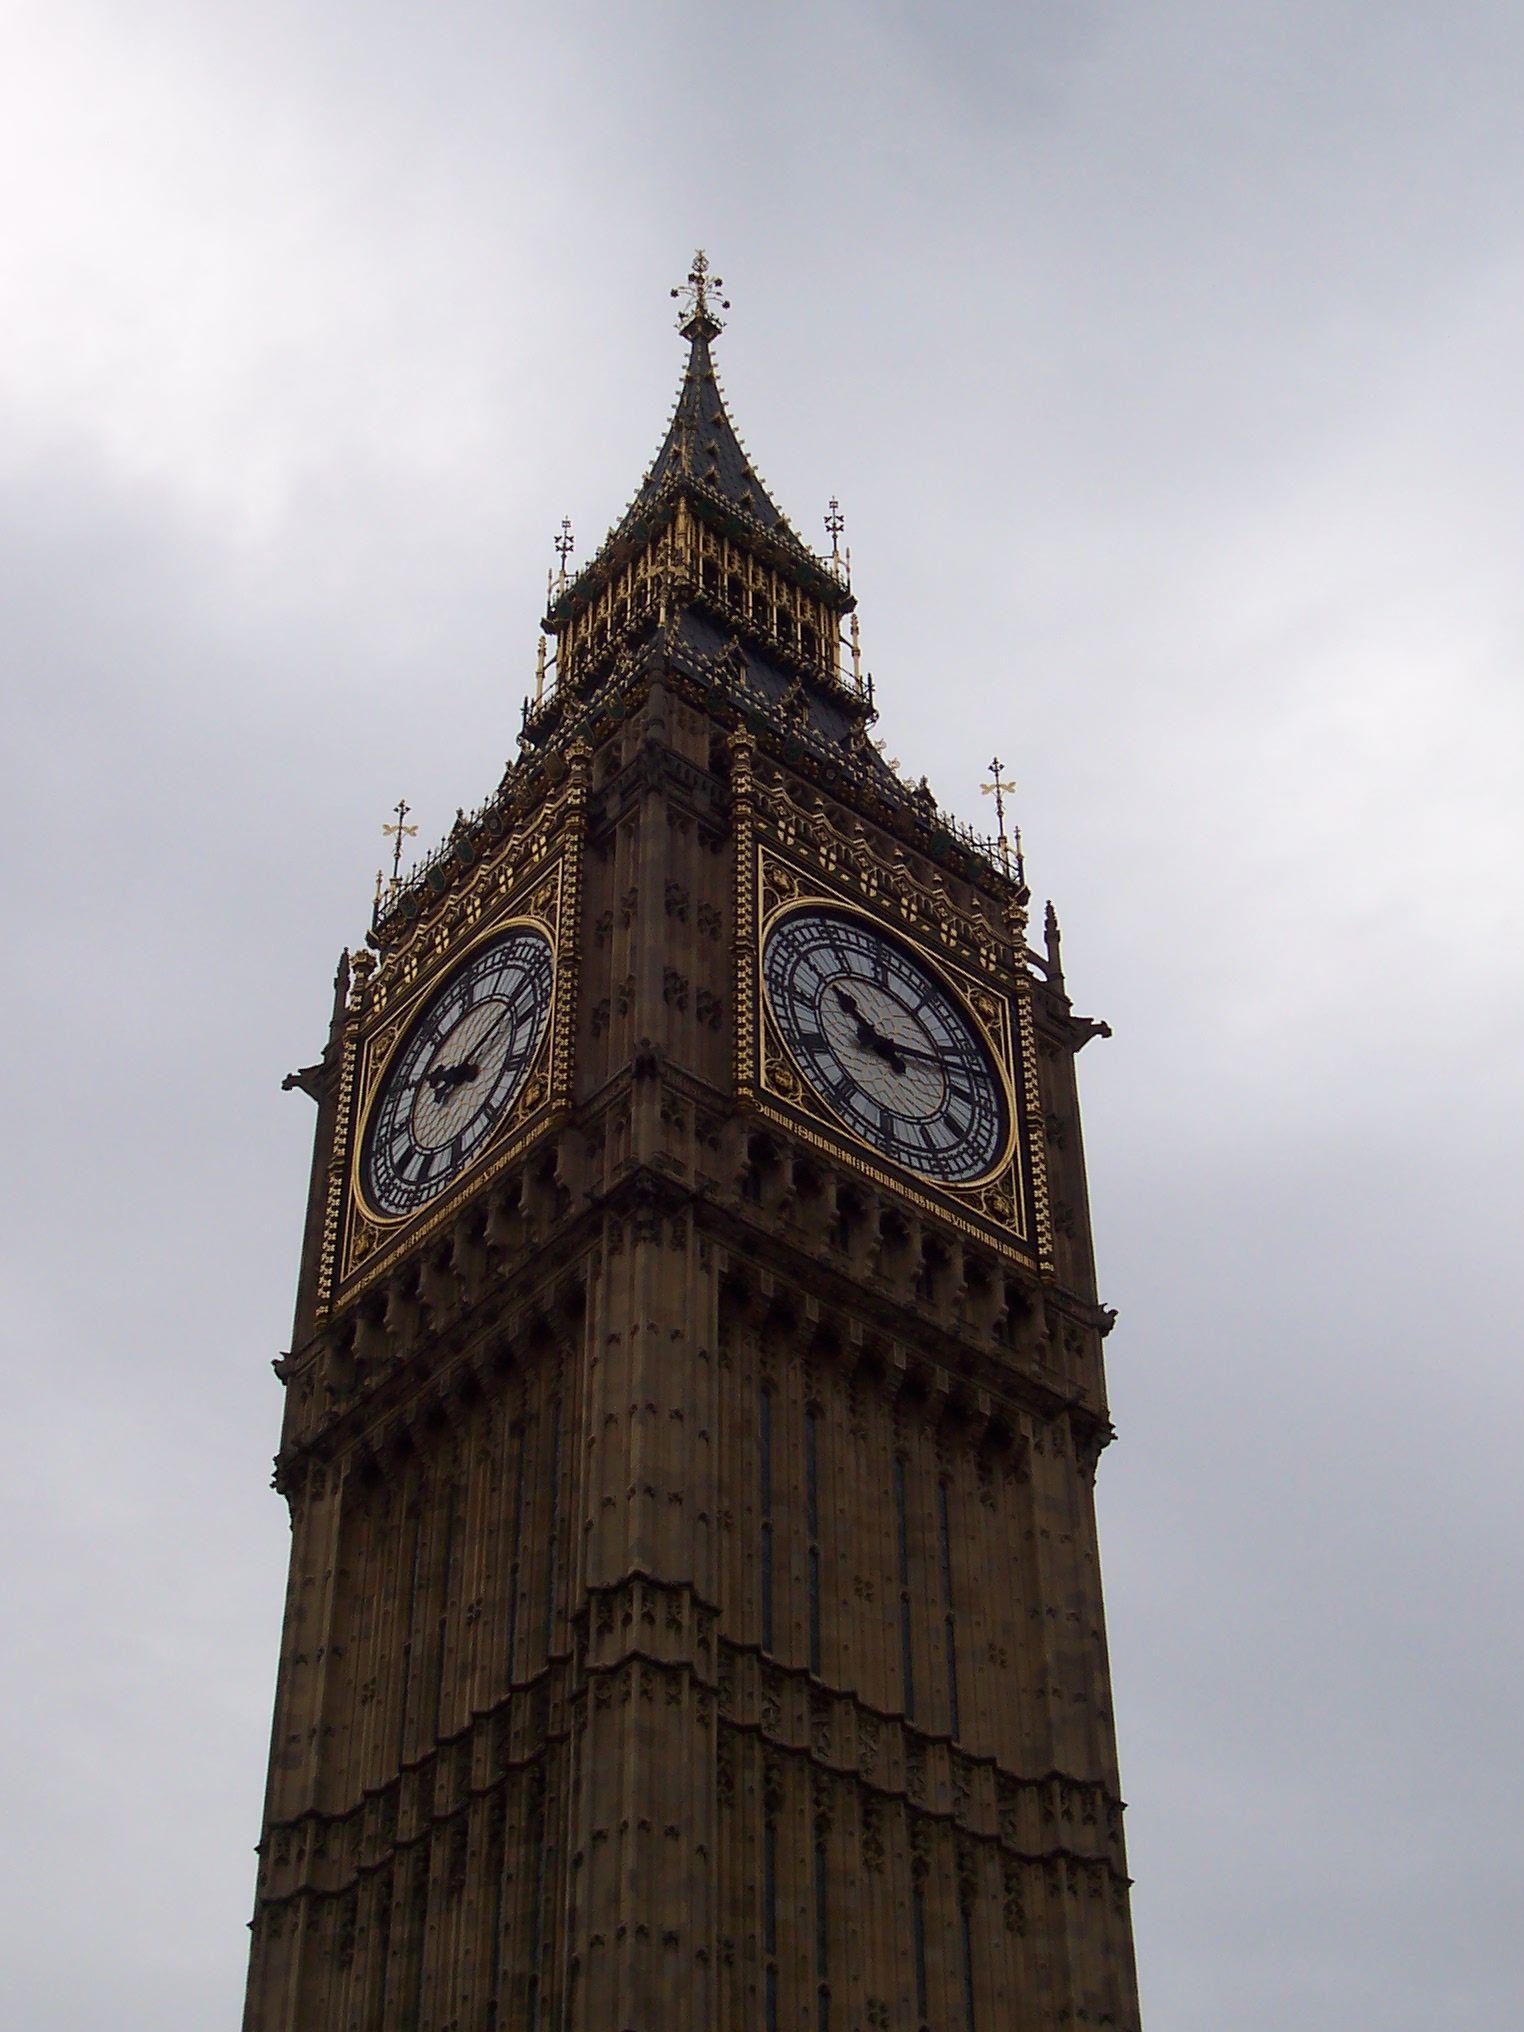 Big Ben, London, England Pic O The Day